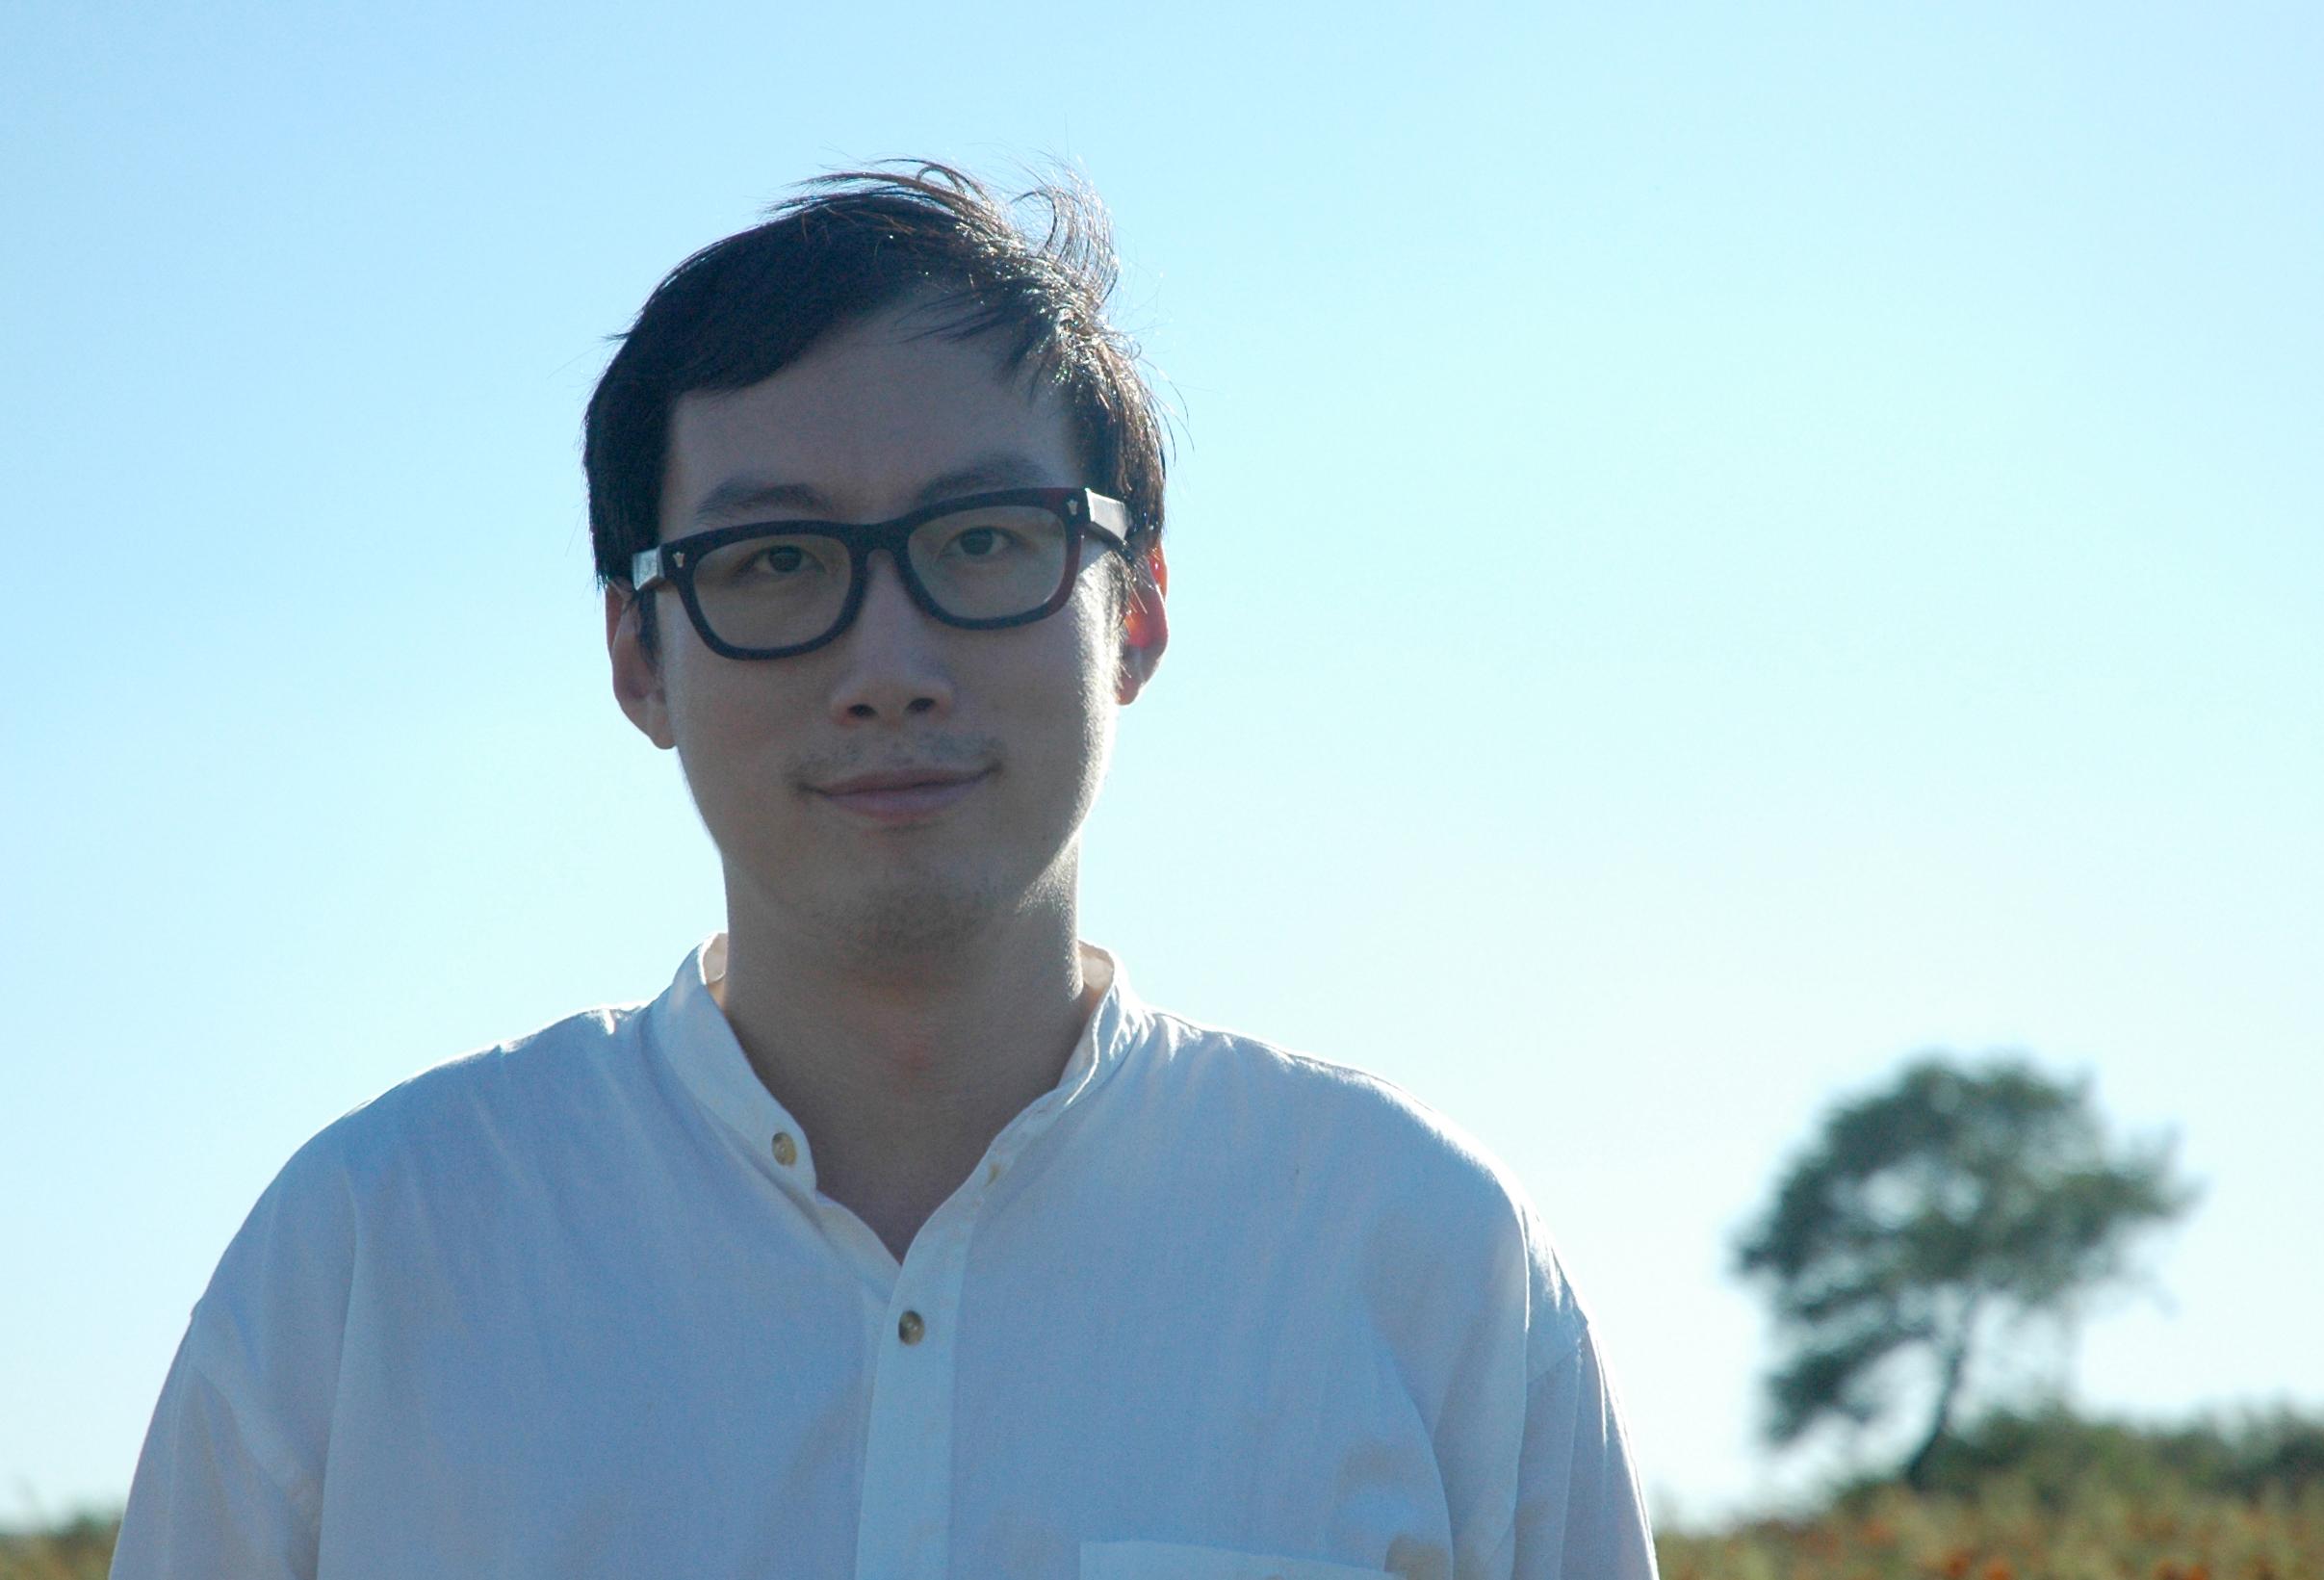 "Rui Yao - 姚睿,中国作家,编剧和导演,广州大学的副教授。 目前是加州大学洛杉矶分校的访问学者。他为电影和电视写了8个剧本,包括林诗颜元(2017)和愤怒的孩子(2013)。 2016年国家社科基金艺术学项目《中国电影""IP""的叙事改编》(项目编号:16CC152)负责人2013年6月,担任2013年度国家社科基金艺术学重大项目《中国电影海外市场竞争策略可行性研究》子课题组《中国电影海外市场政策及竞争策略》研究骨干成员。"